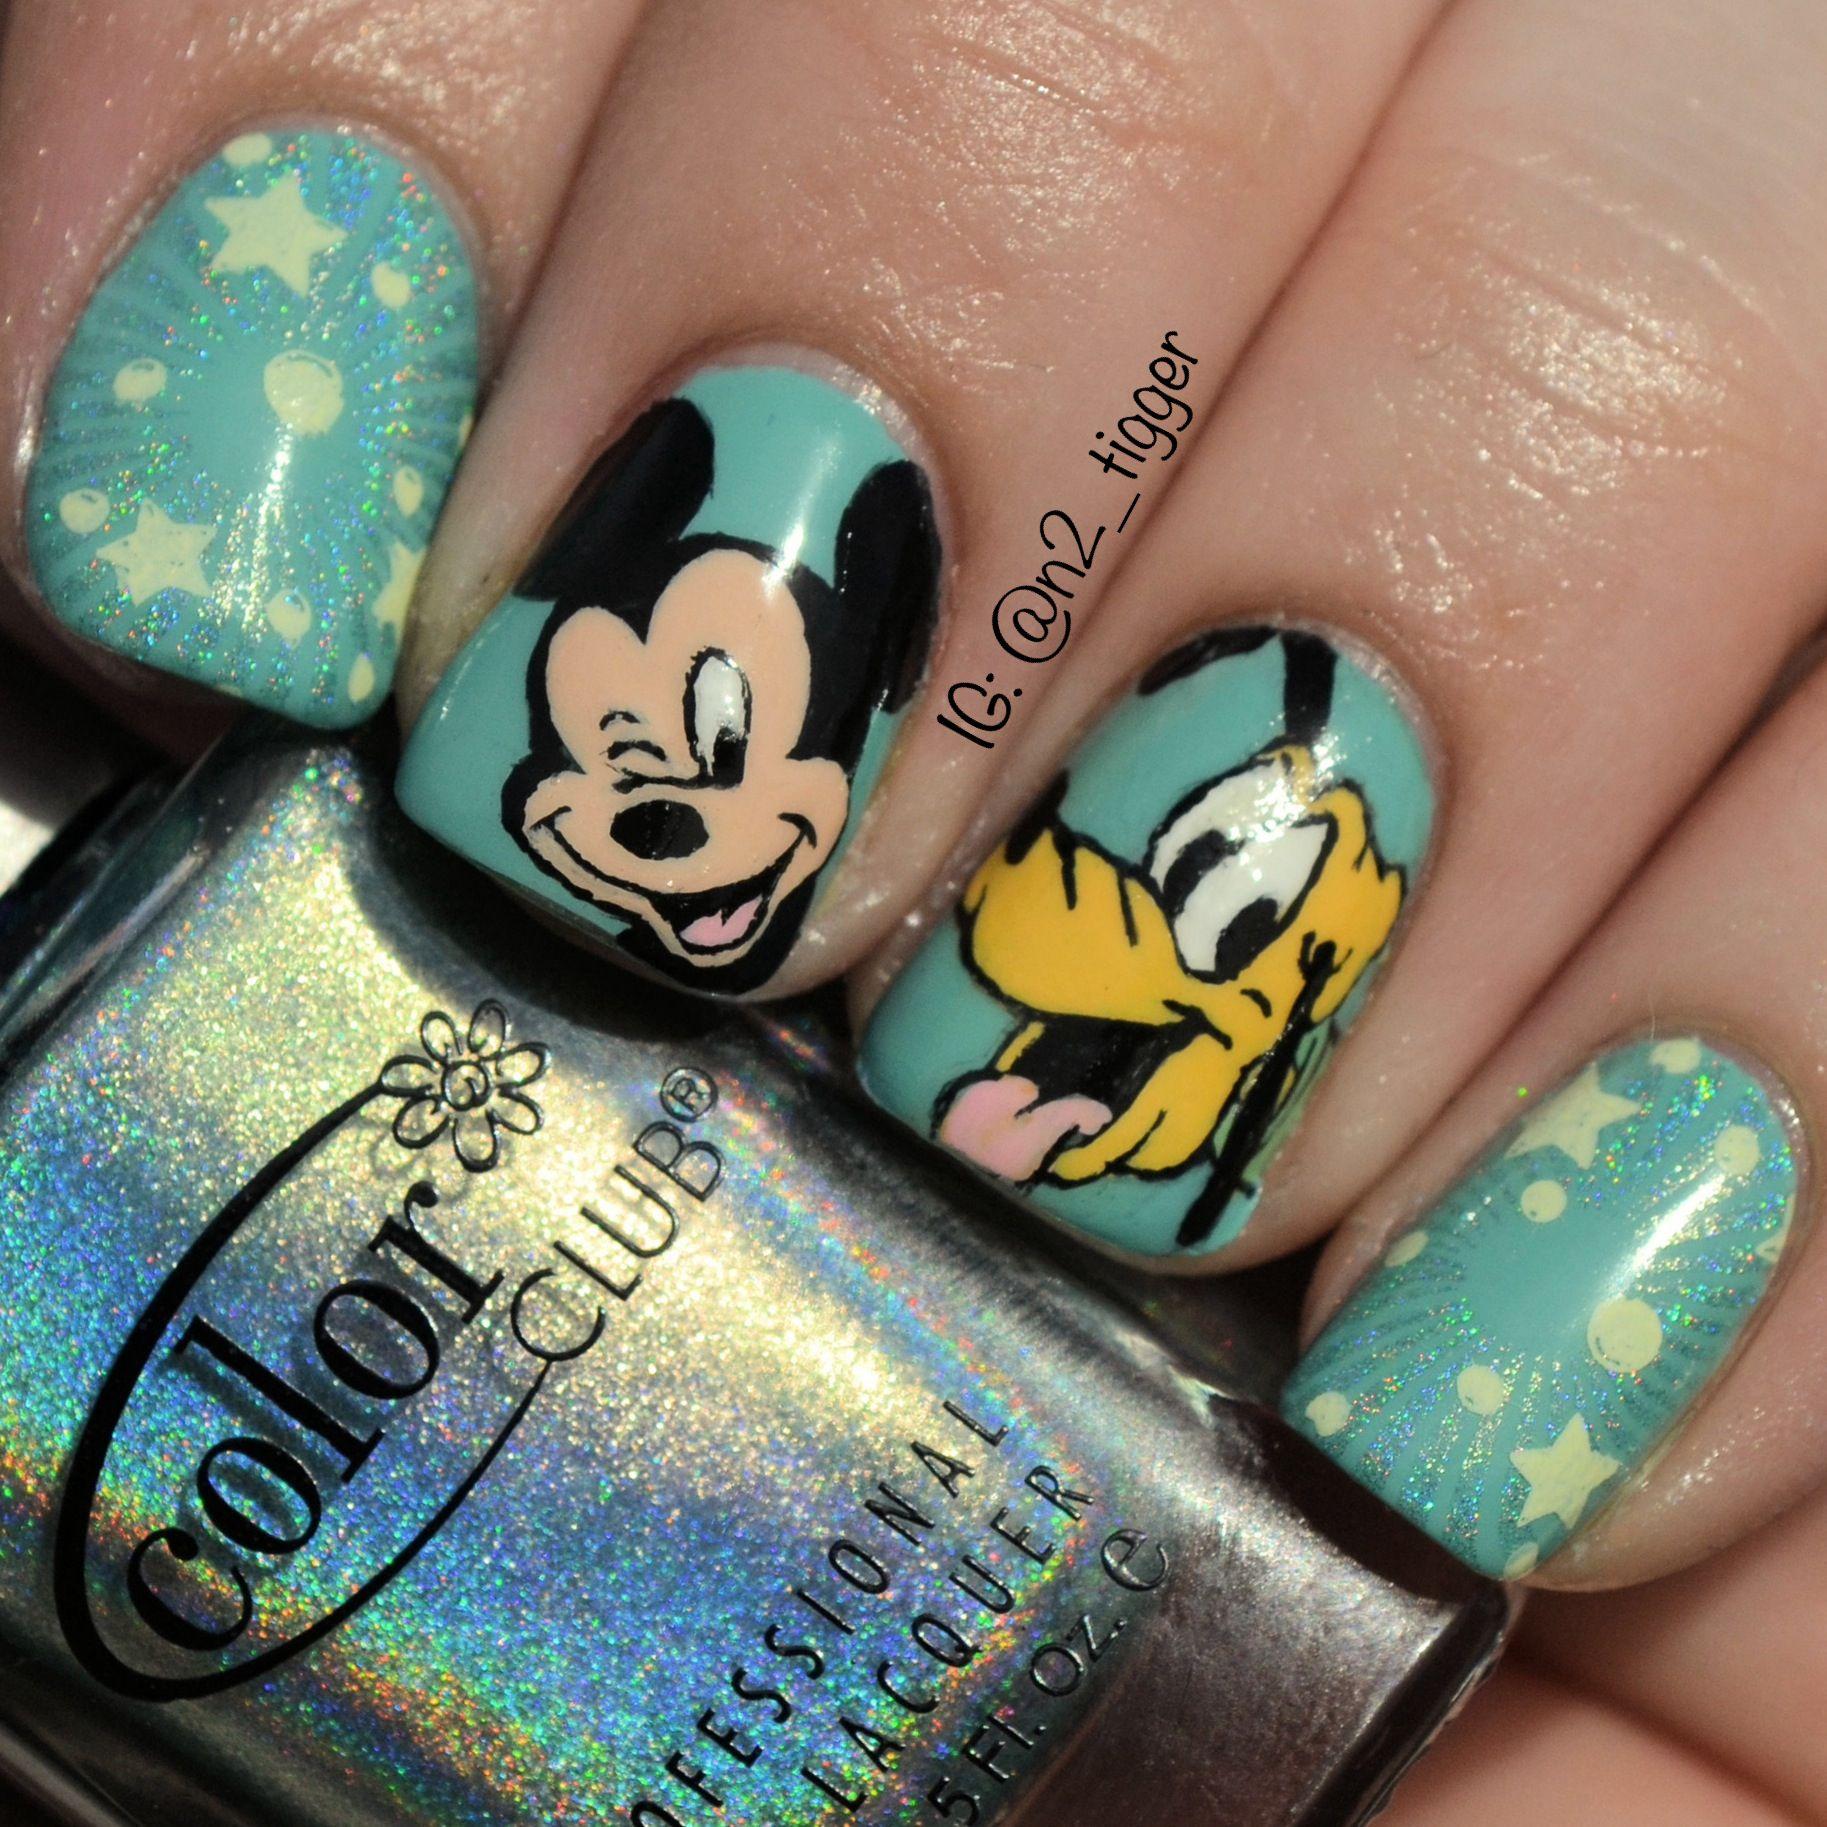 Disney-themed nail art - Mickey Mouse and Pluto | Nail Art ...